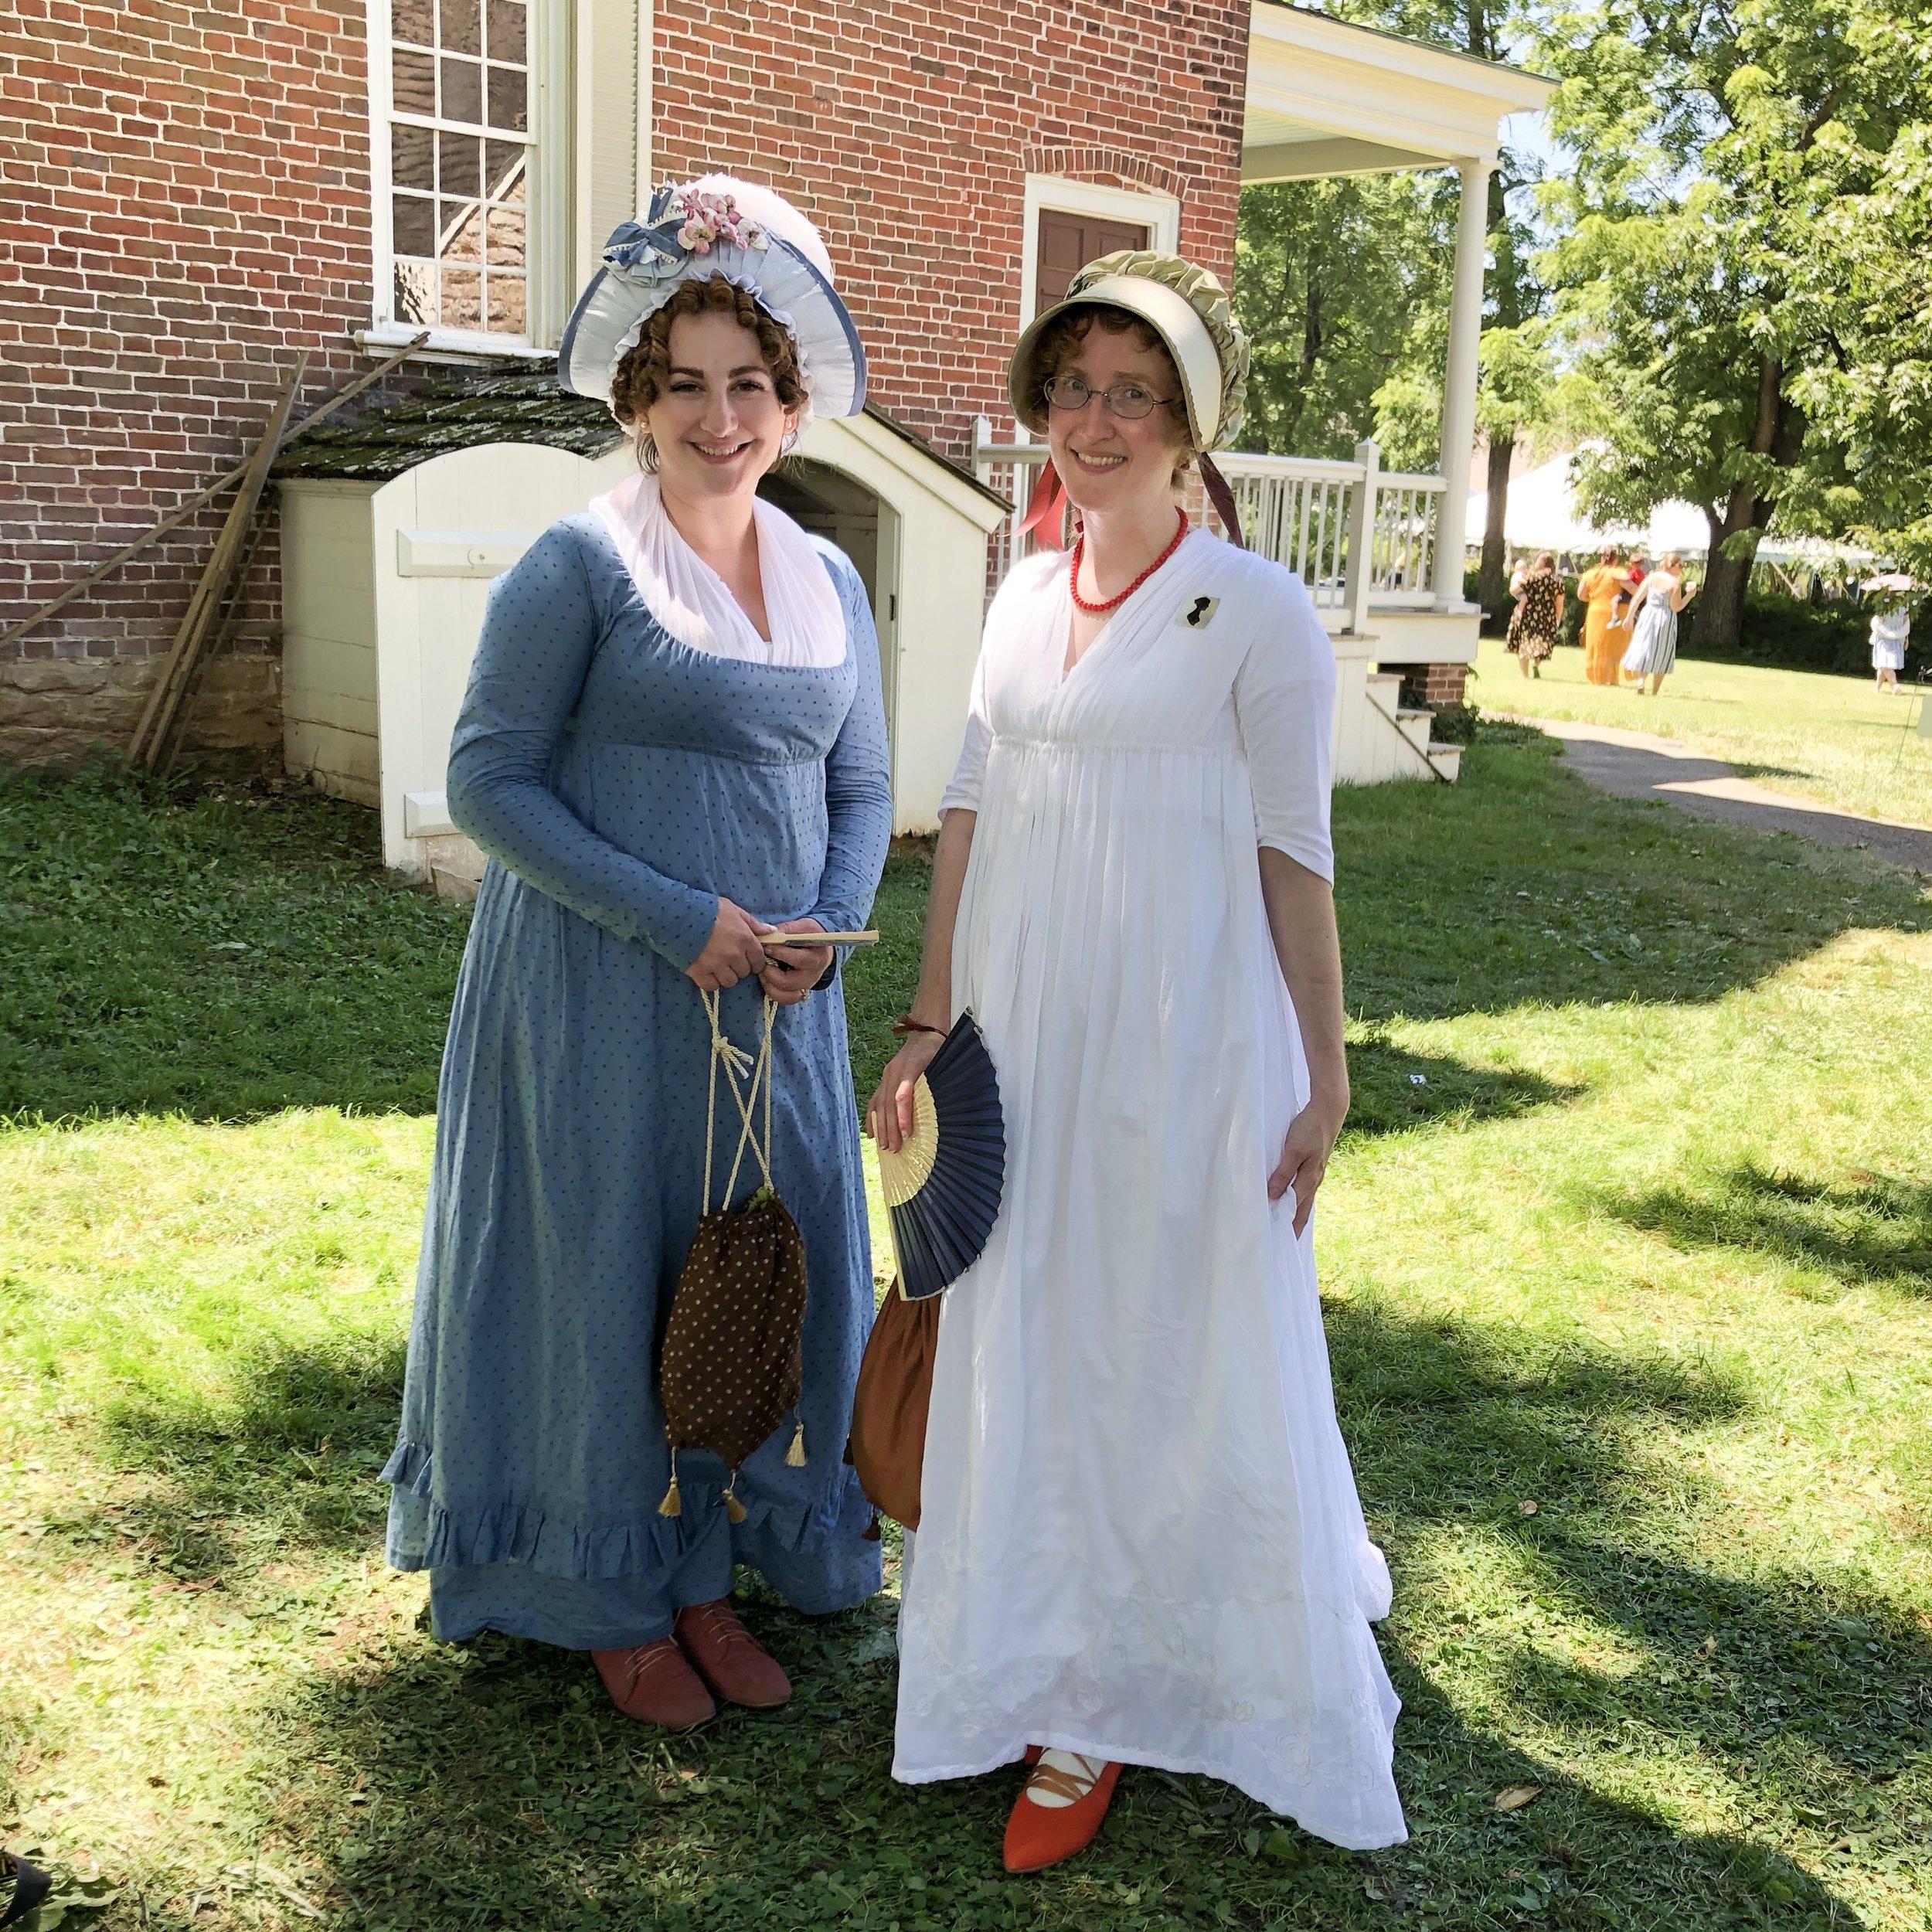 Jane Austen Festival Louisville Kentucky 2019 Shocking bad hats